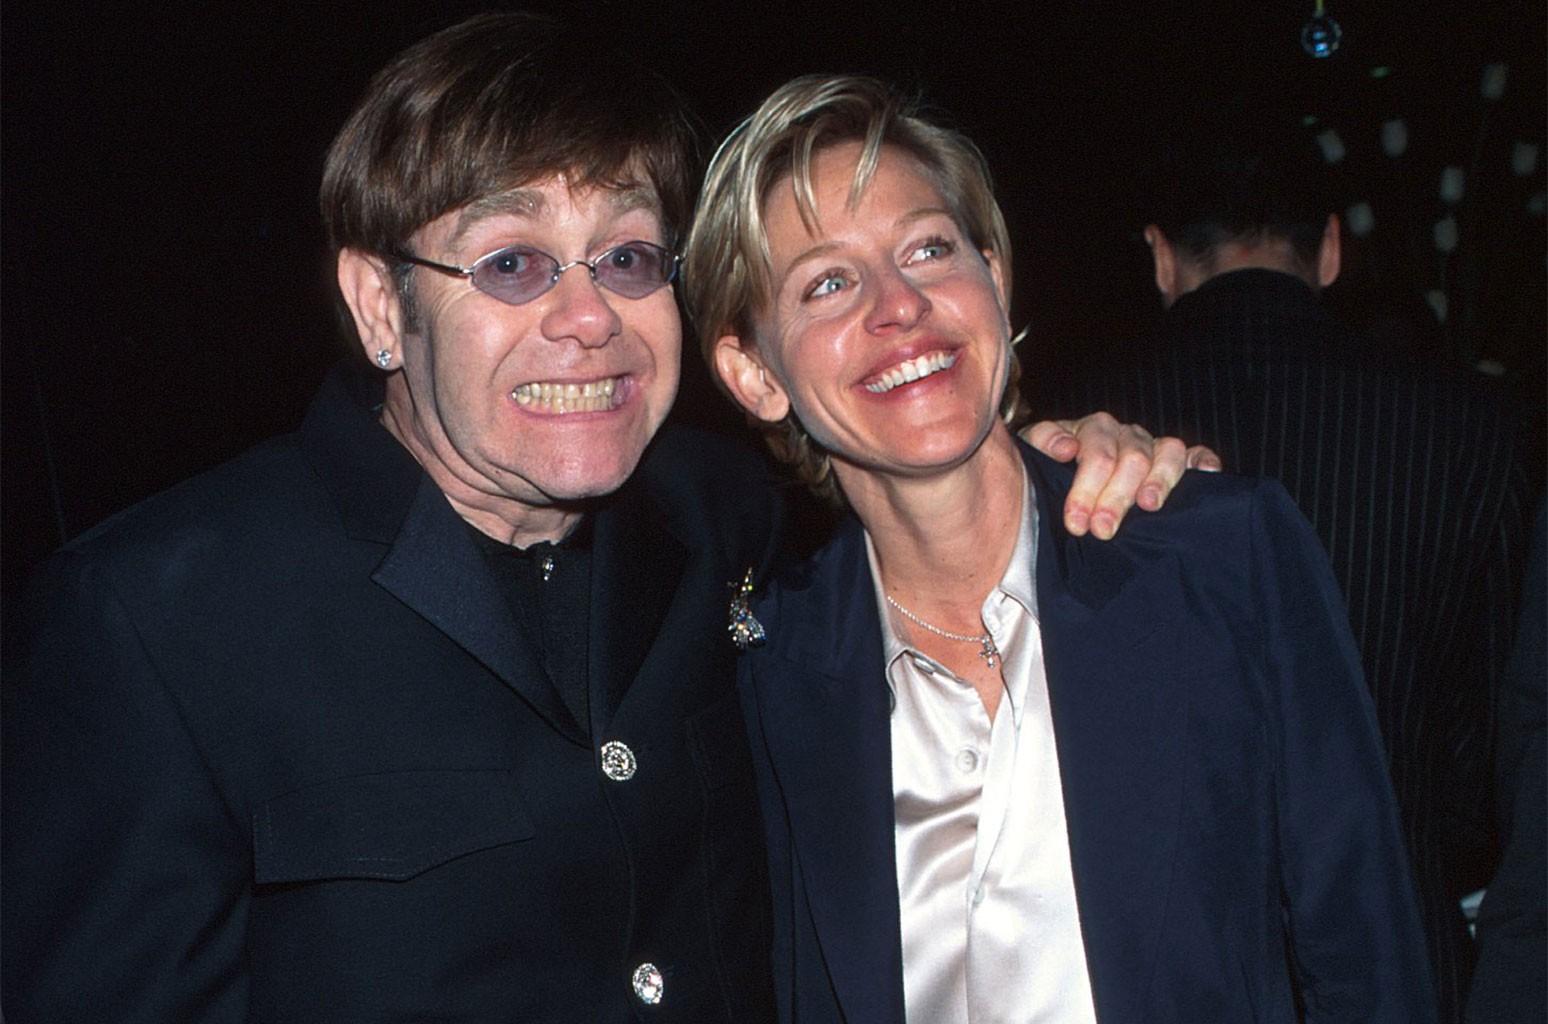 Elton John and Ellen Degeneres